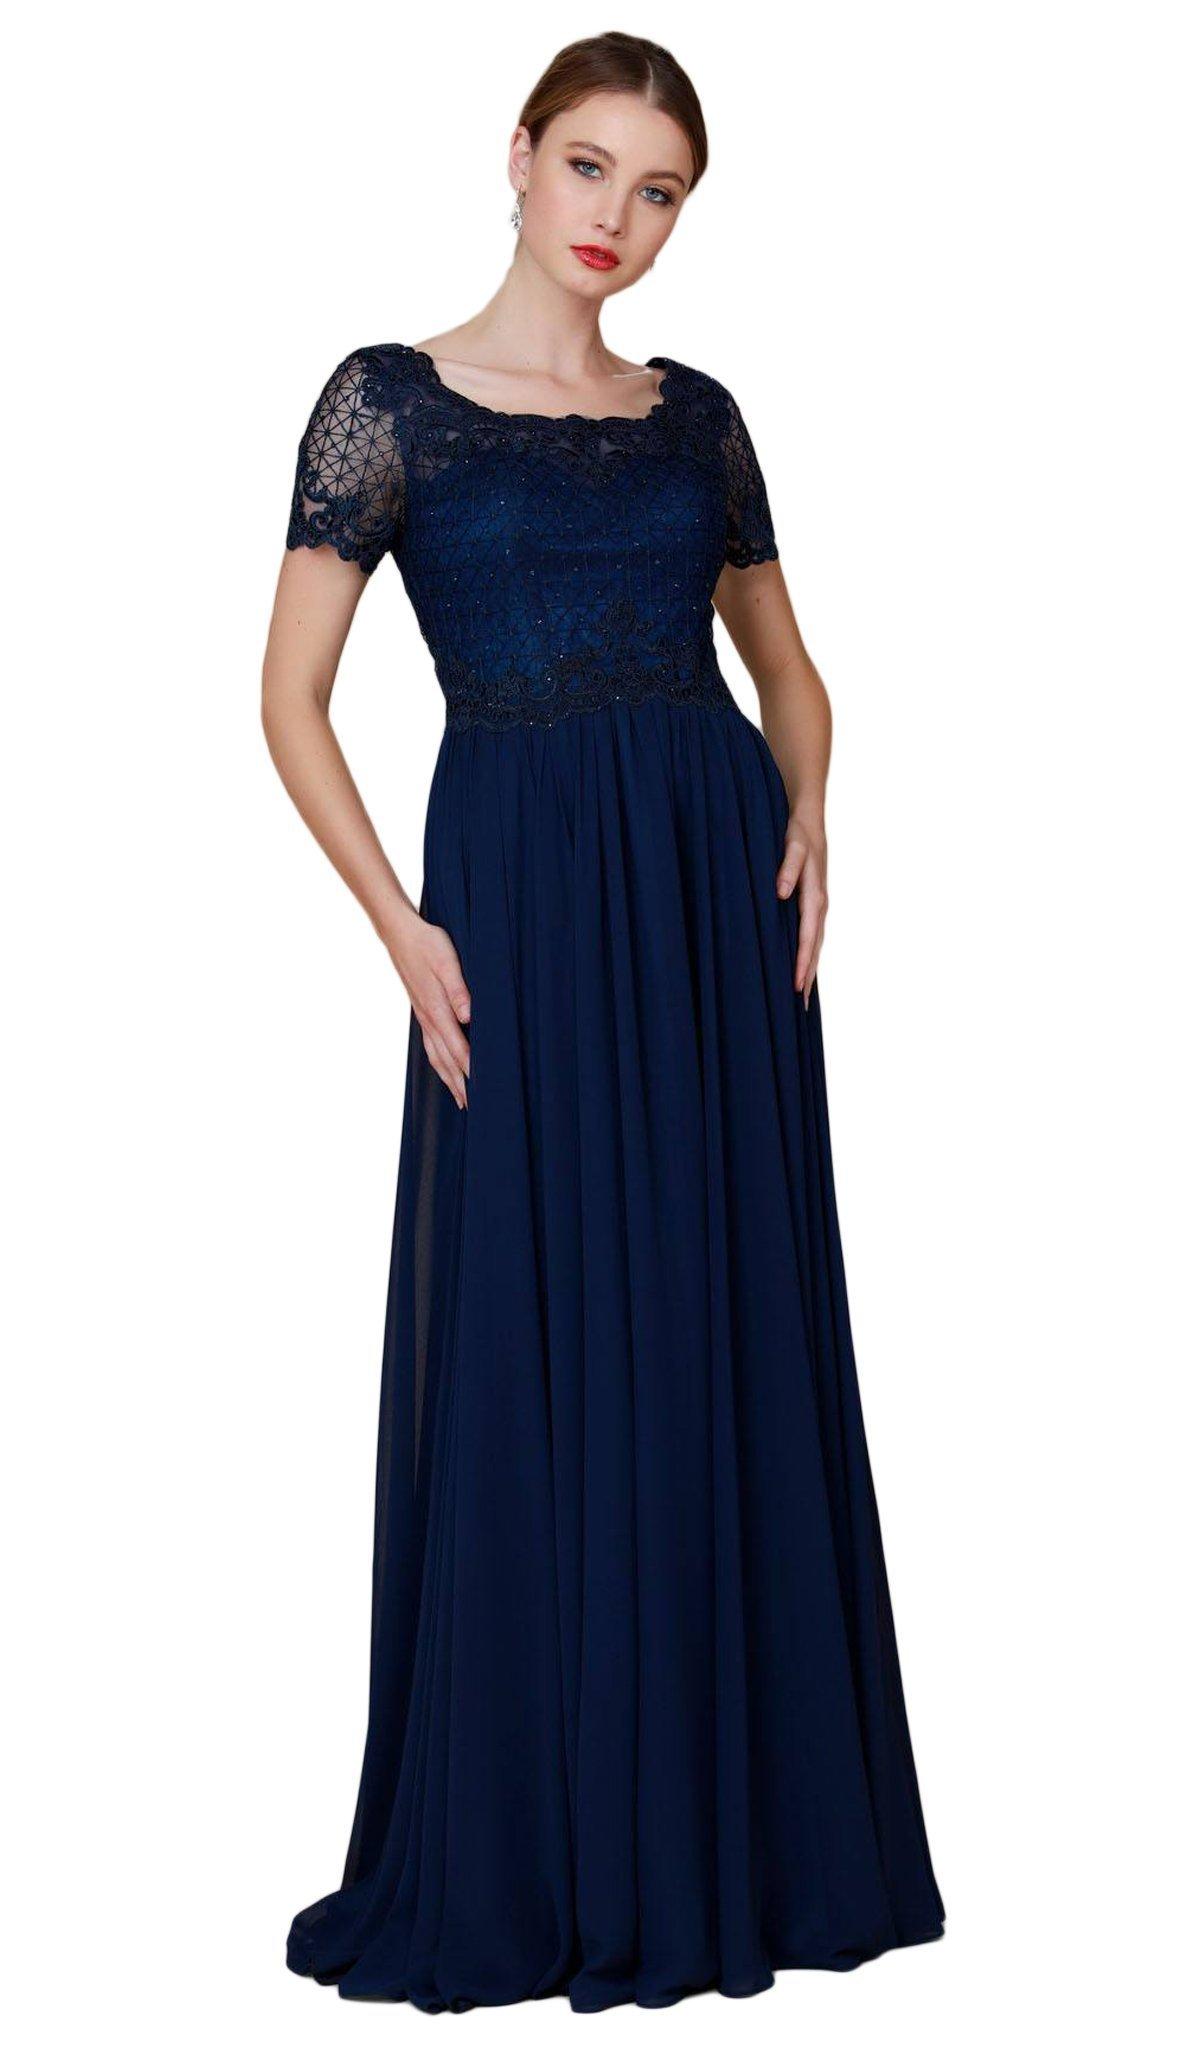 Nox Anabel - Y514 Lace Applique Short Sleeve Top Chiffon Dress